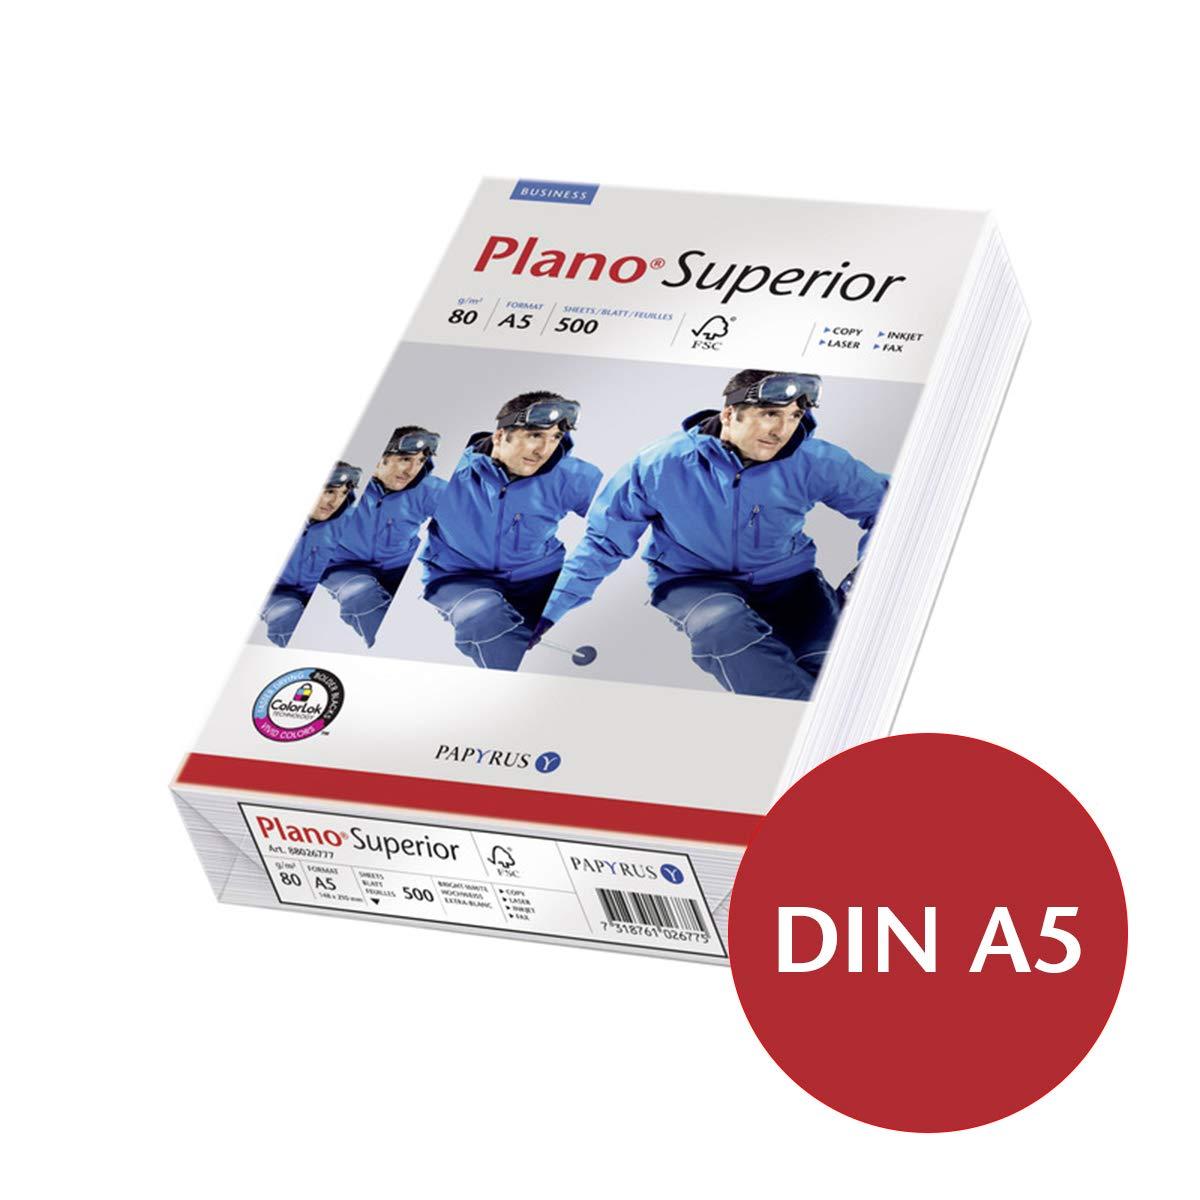 Plano Superior 80g/m² DIN-A5 - 500 Blatt Papier weiß